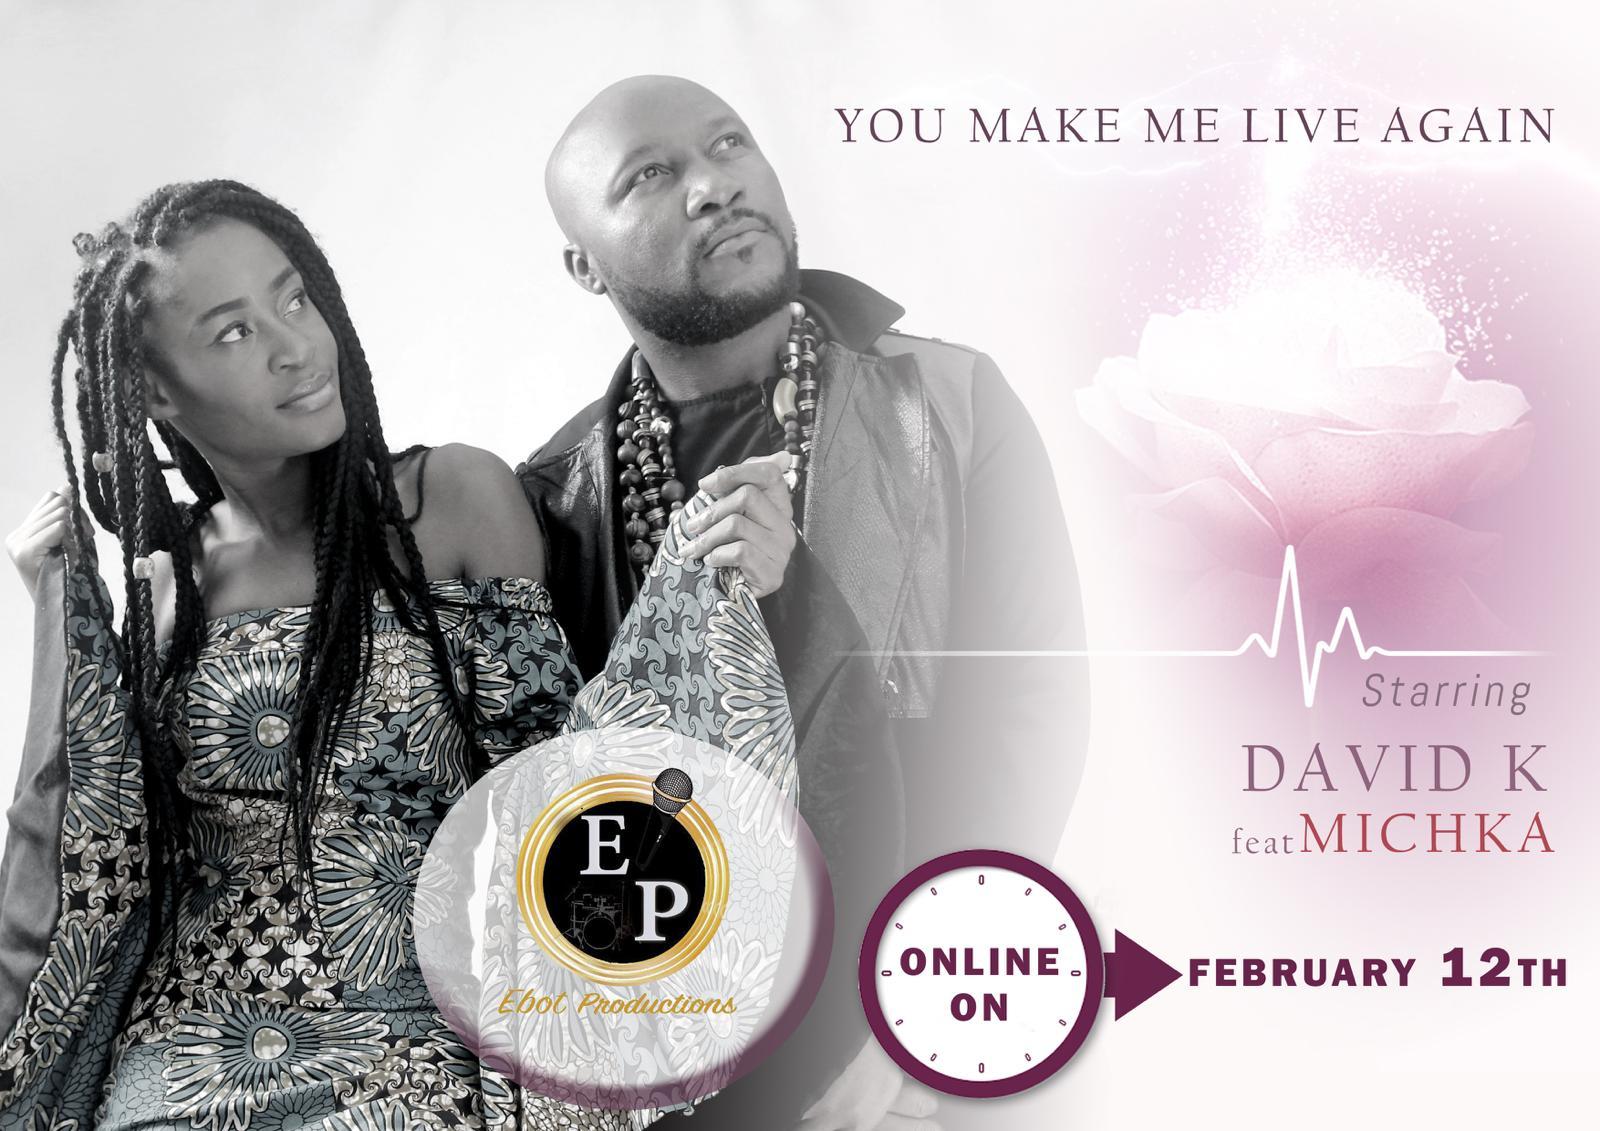 David k ft Michka - You Make Me Live Again ( Mp3 Download